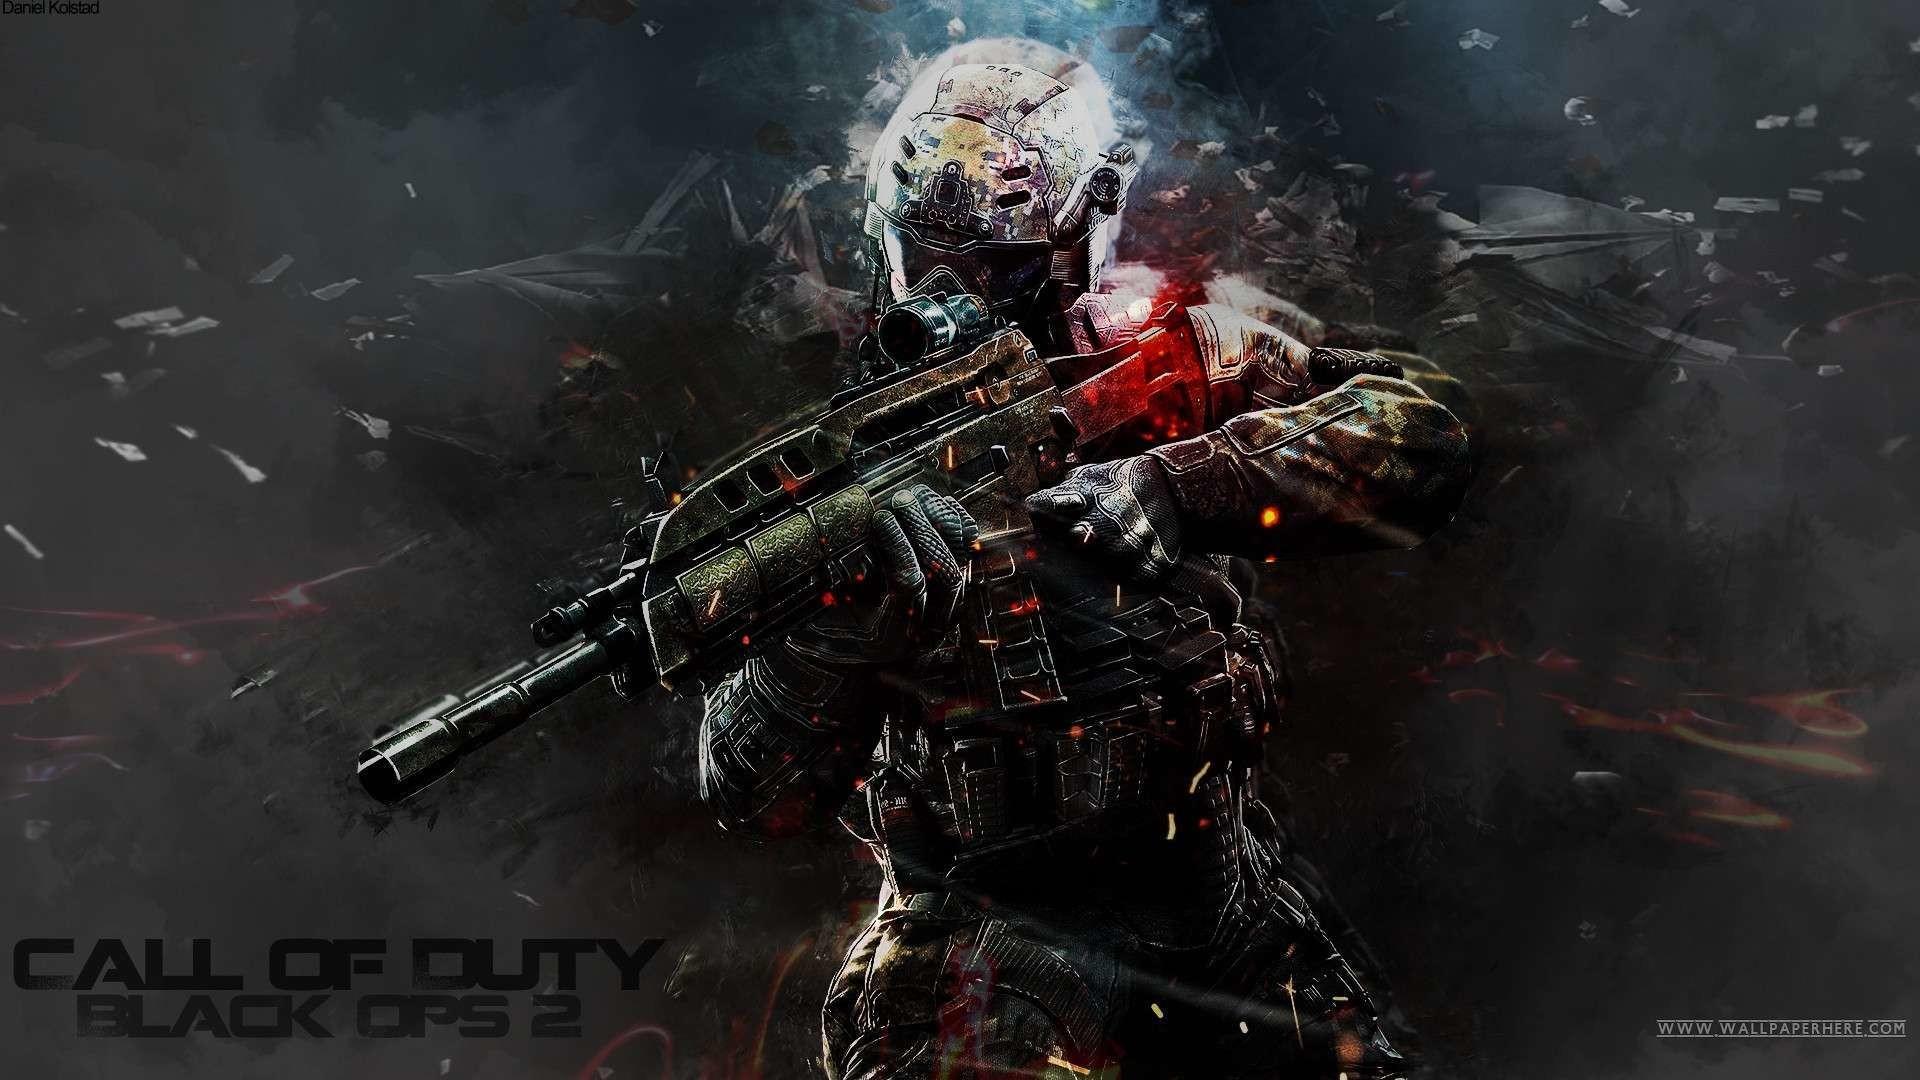 View Of Call Of Duty Game Desktop Wallpaper : Nice Wallpapers